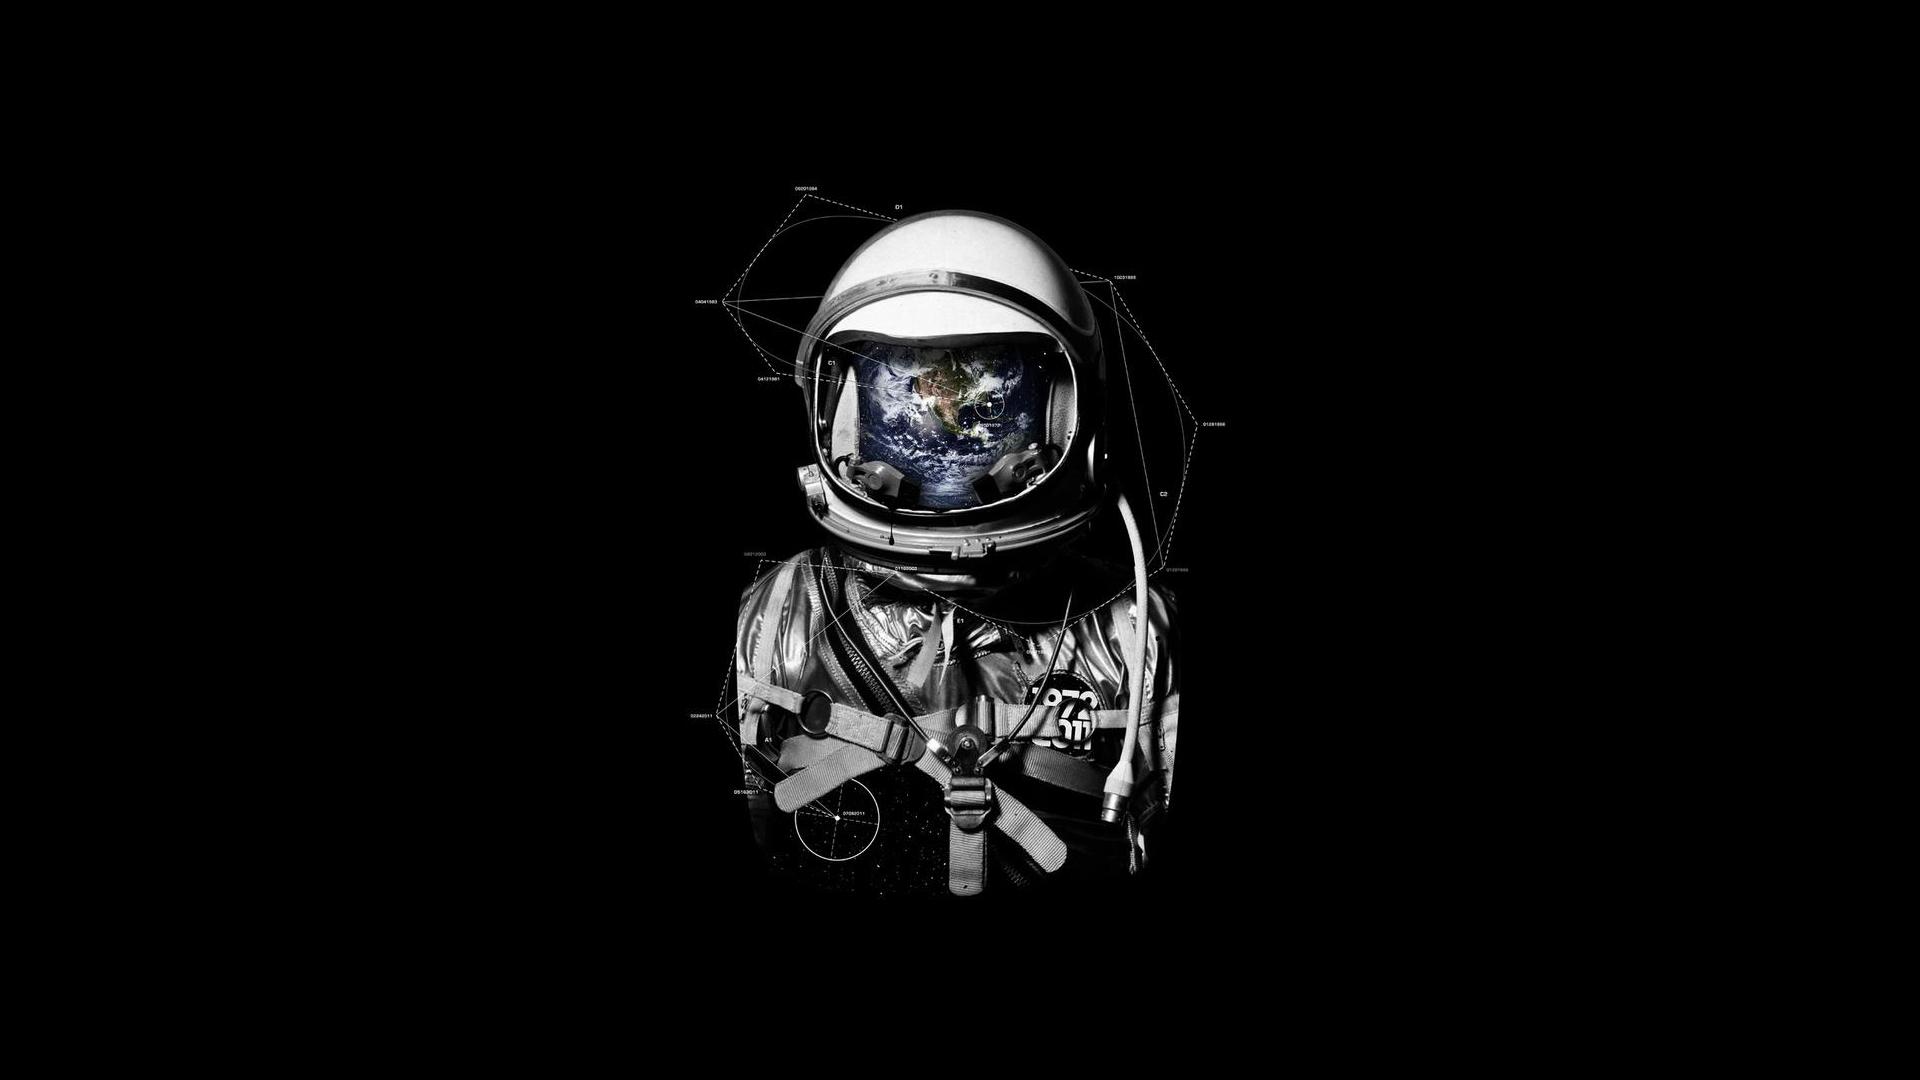 Hd wallpaper astronaut - Astronaut Wallpapers Wallpapersafari